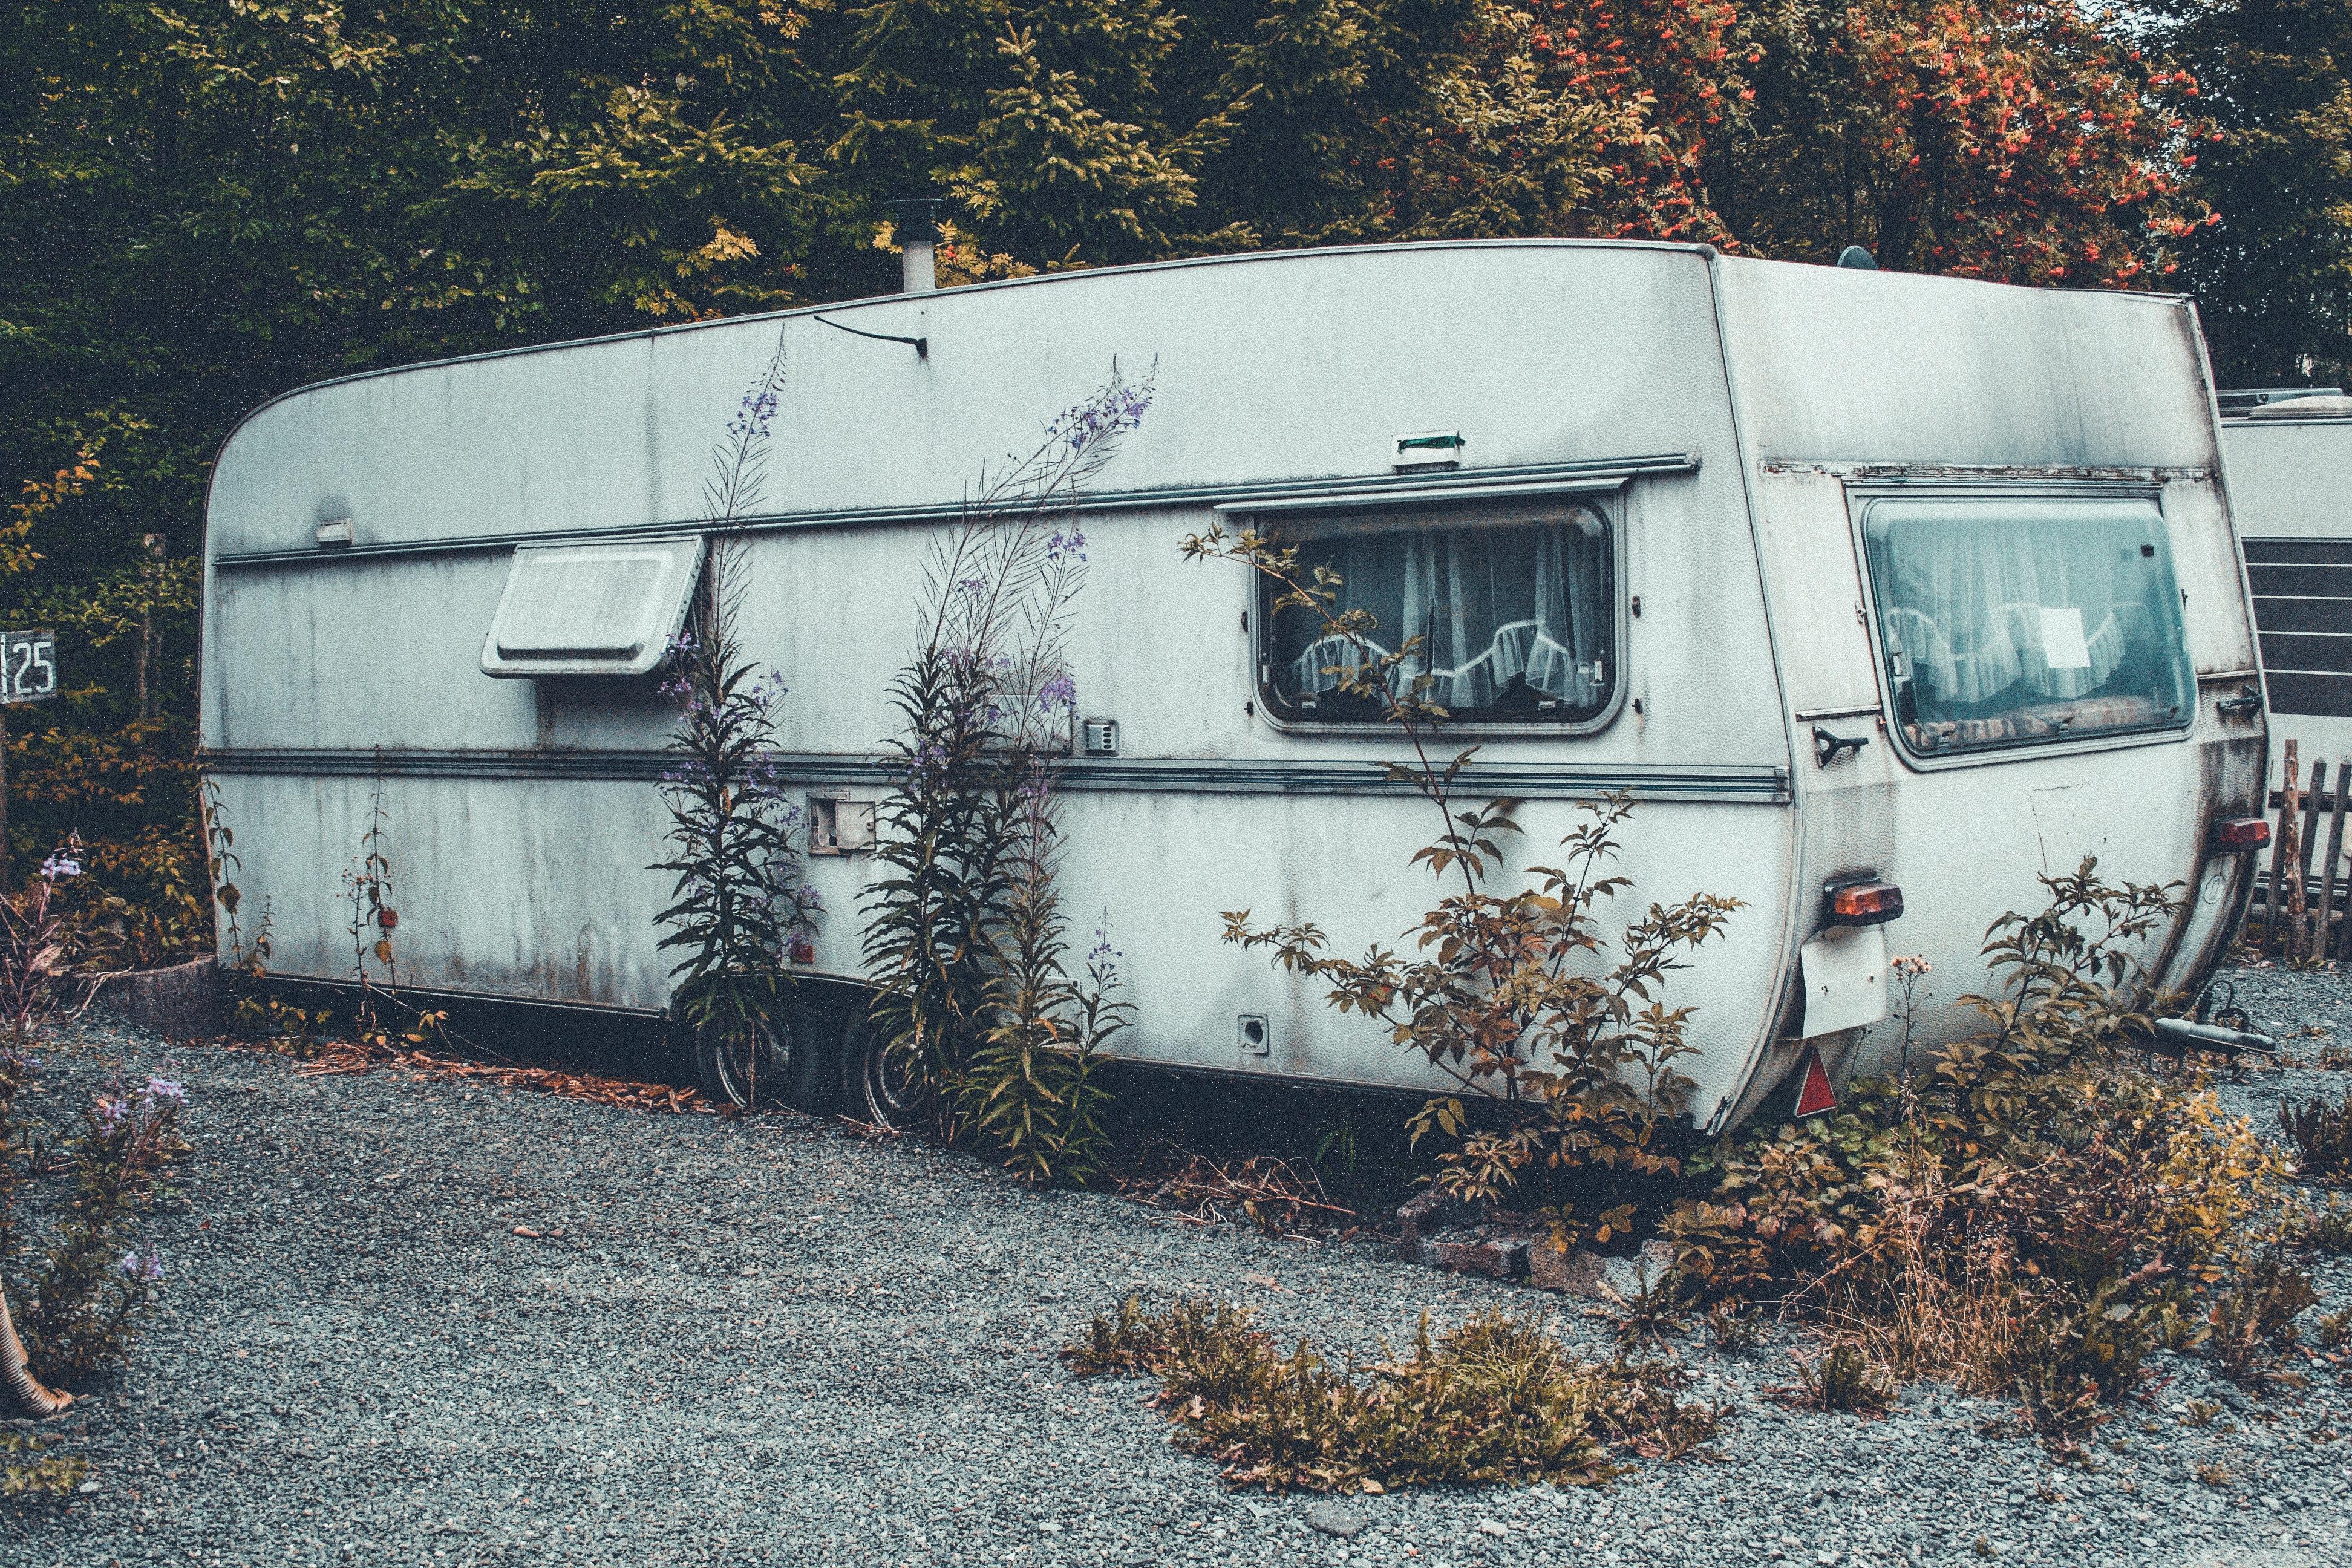 This is a photo of an old, run down caravan.